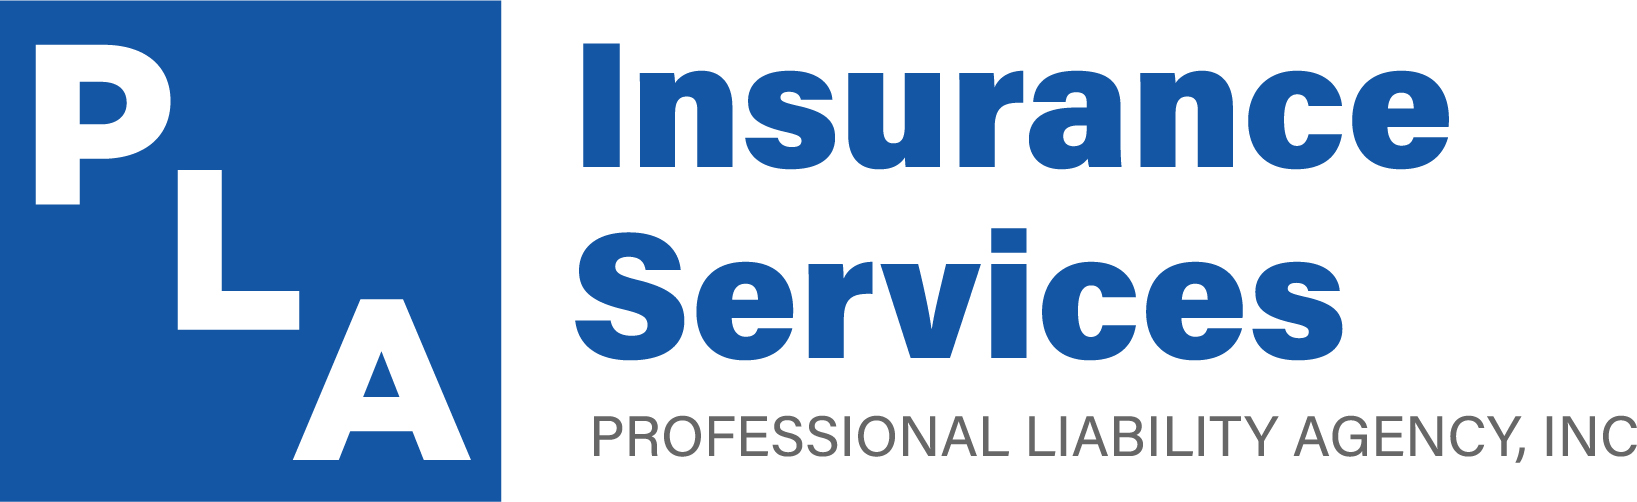 PLA Insurance Services